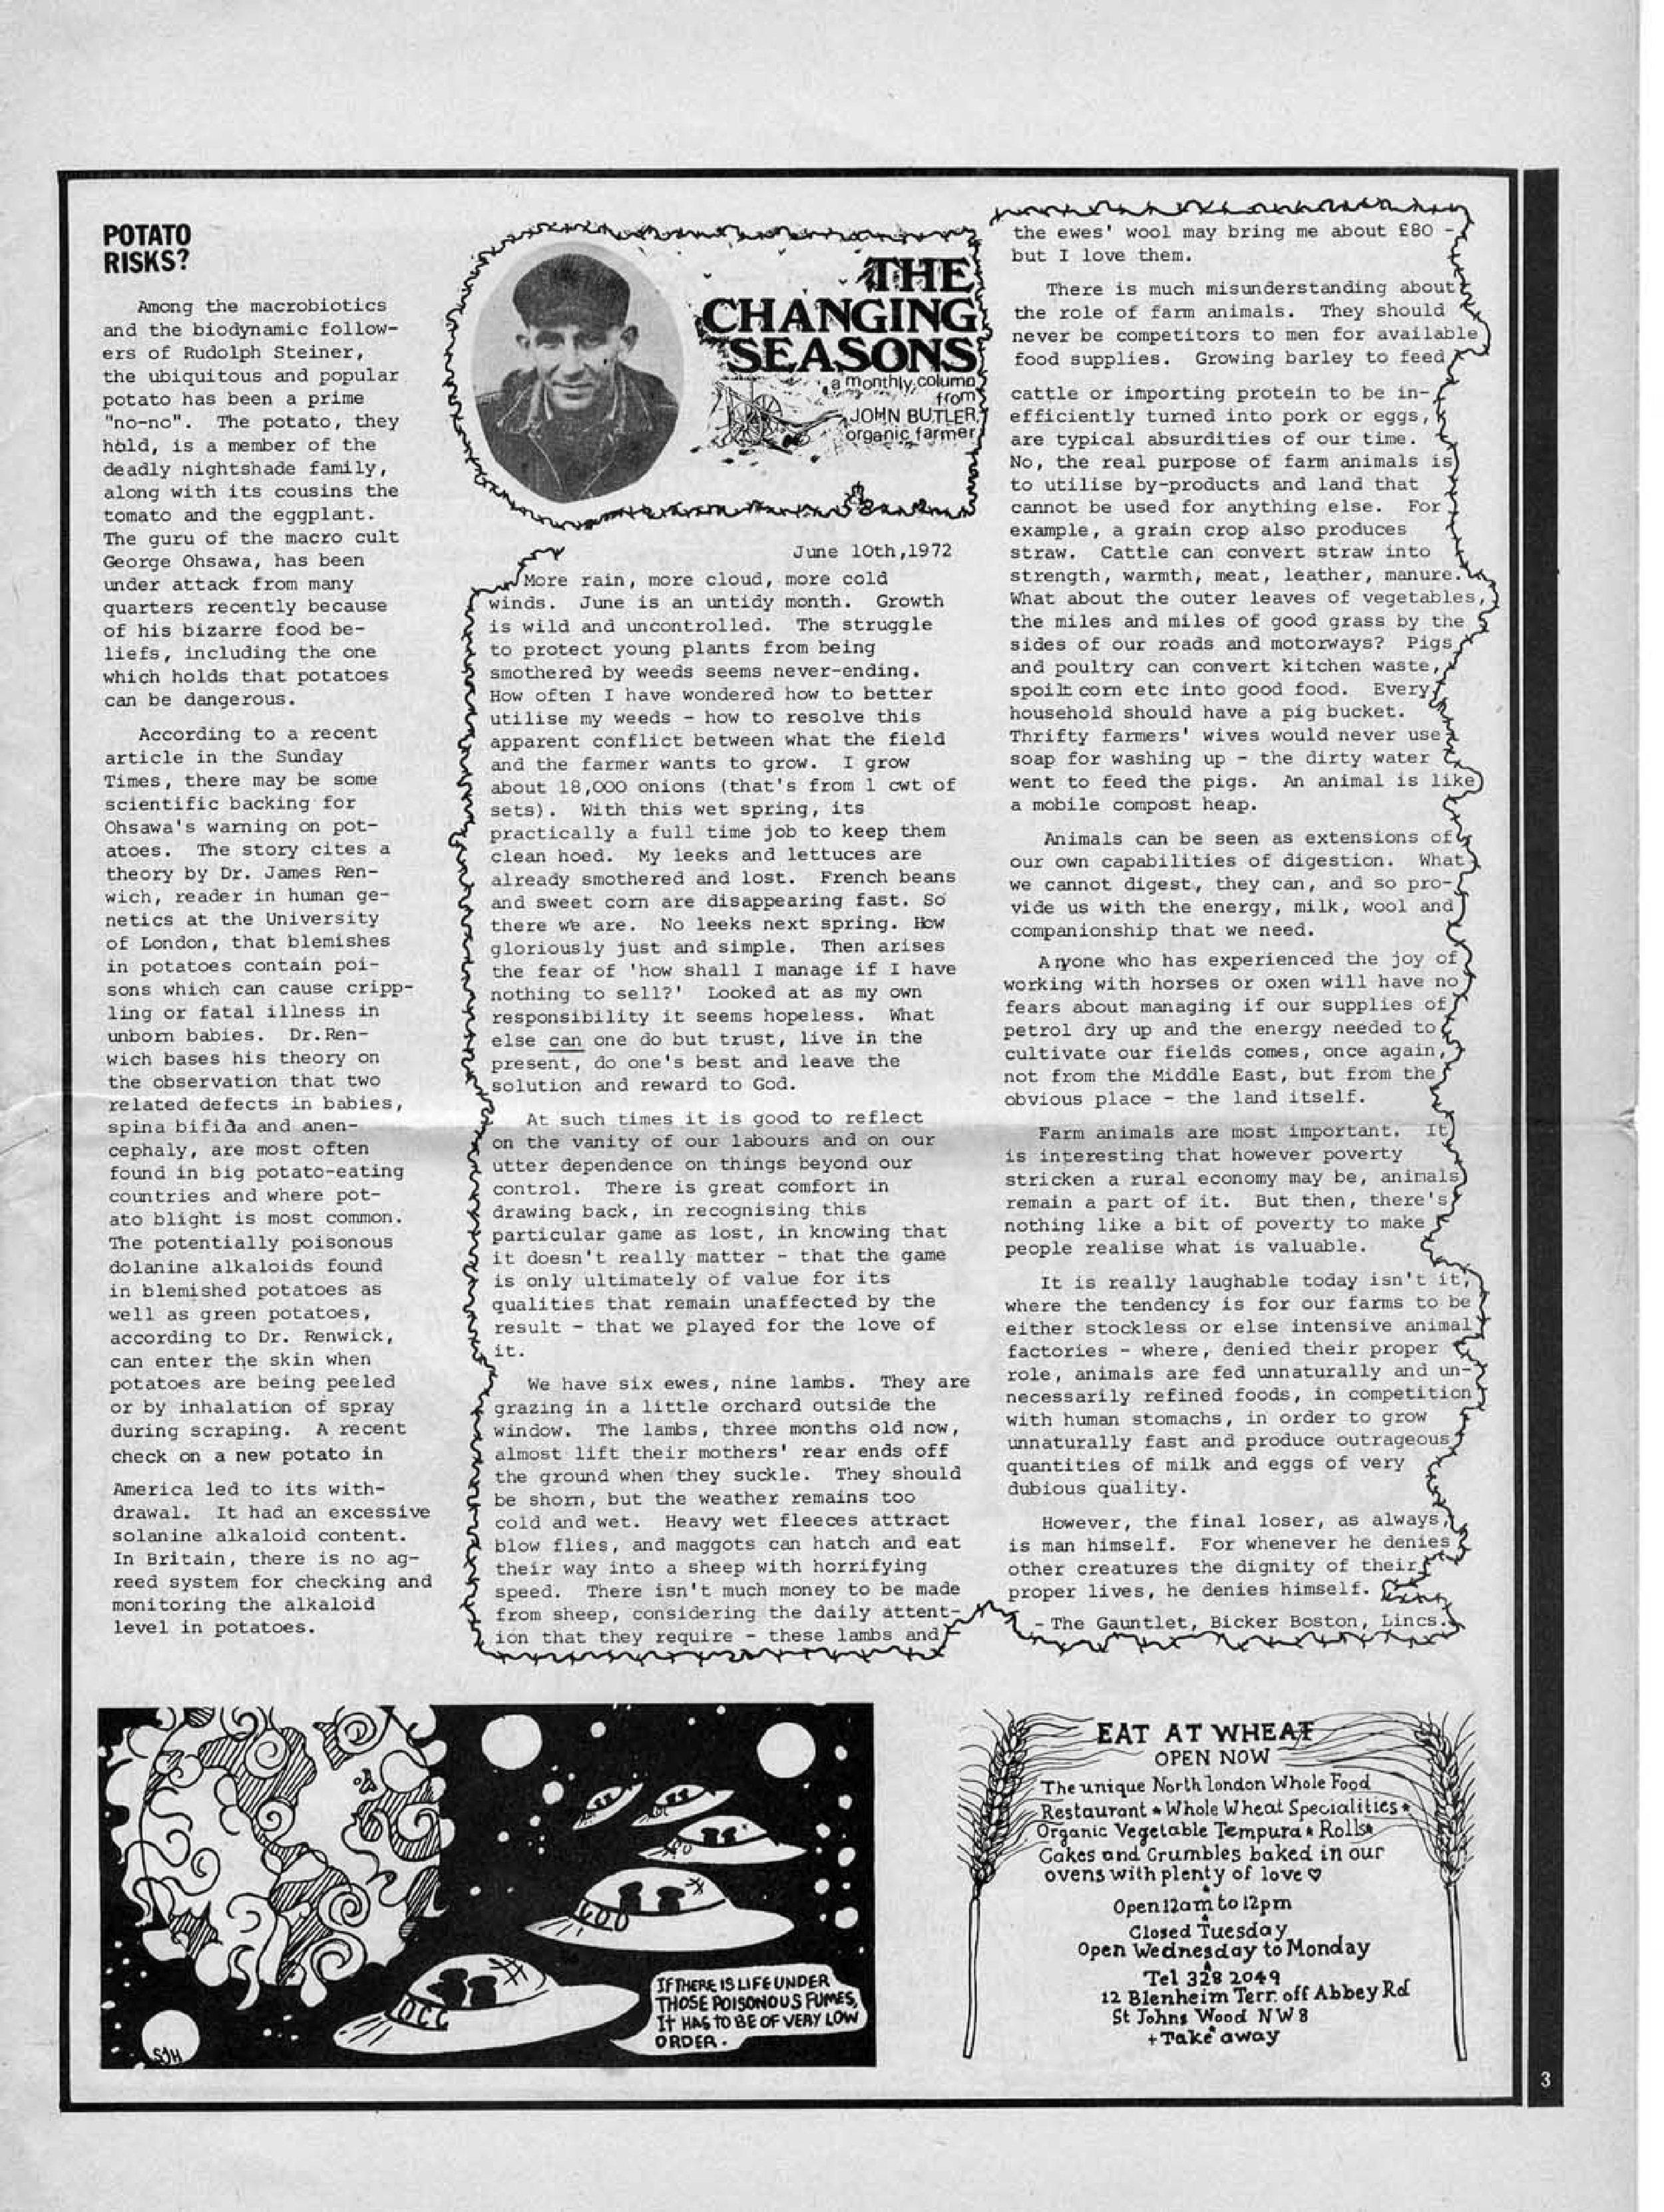 seed-v1-n4-june1972-03.jpg